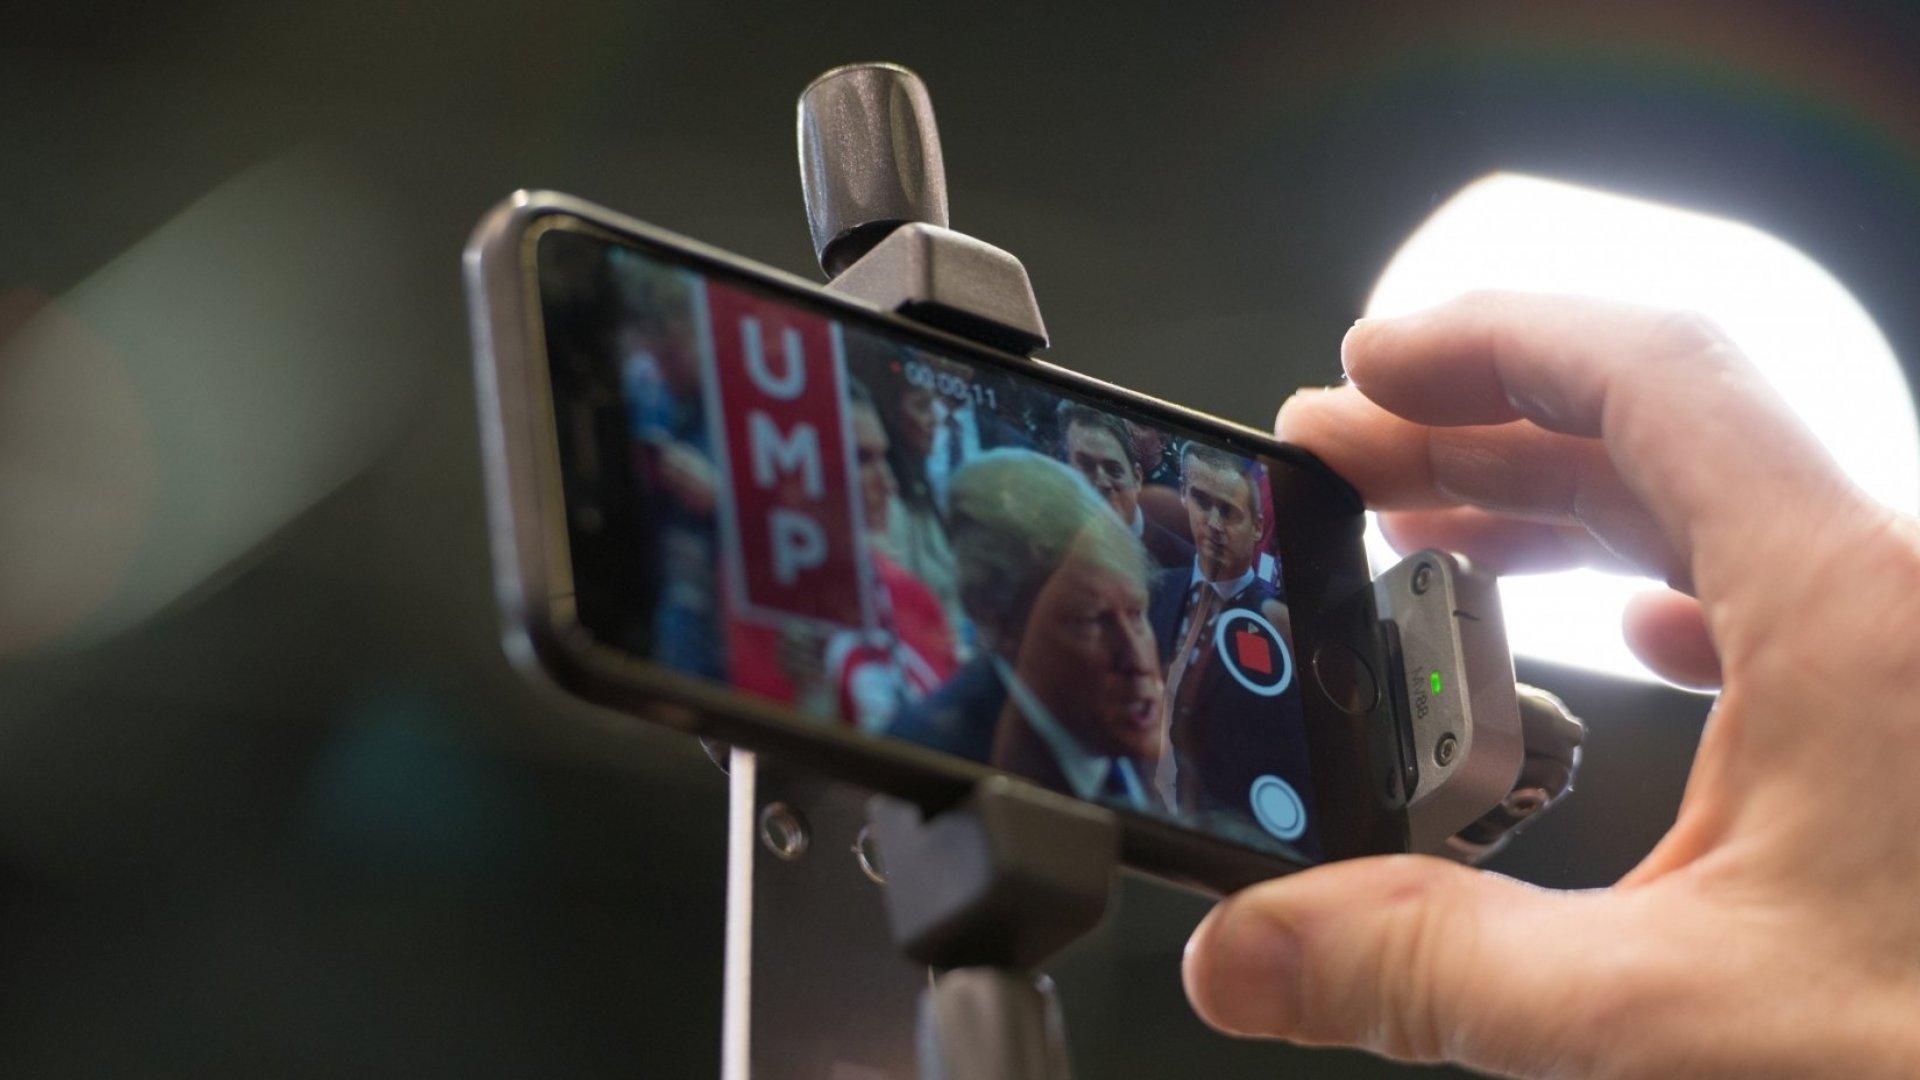 Apple Refuses to Take Part in GOP Convention, Trump Backers Seek Boycott